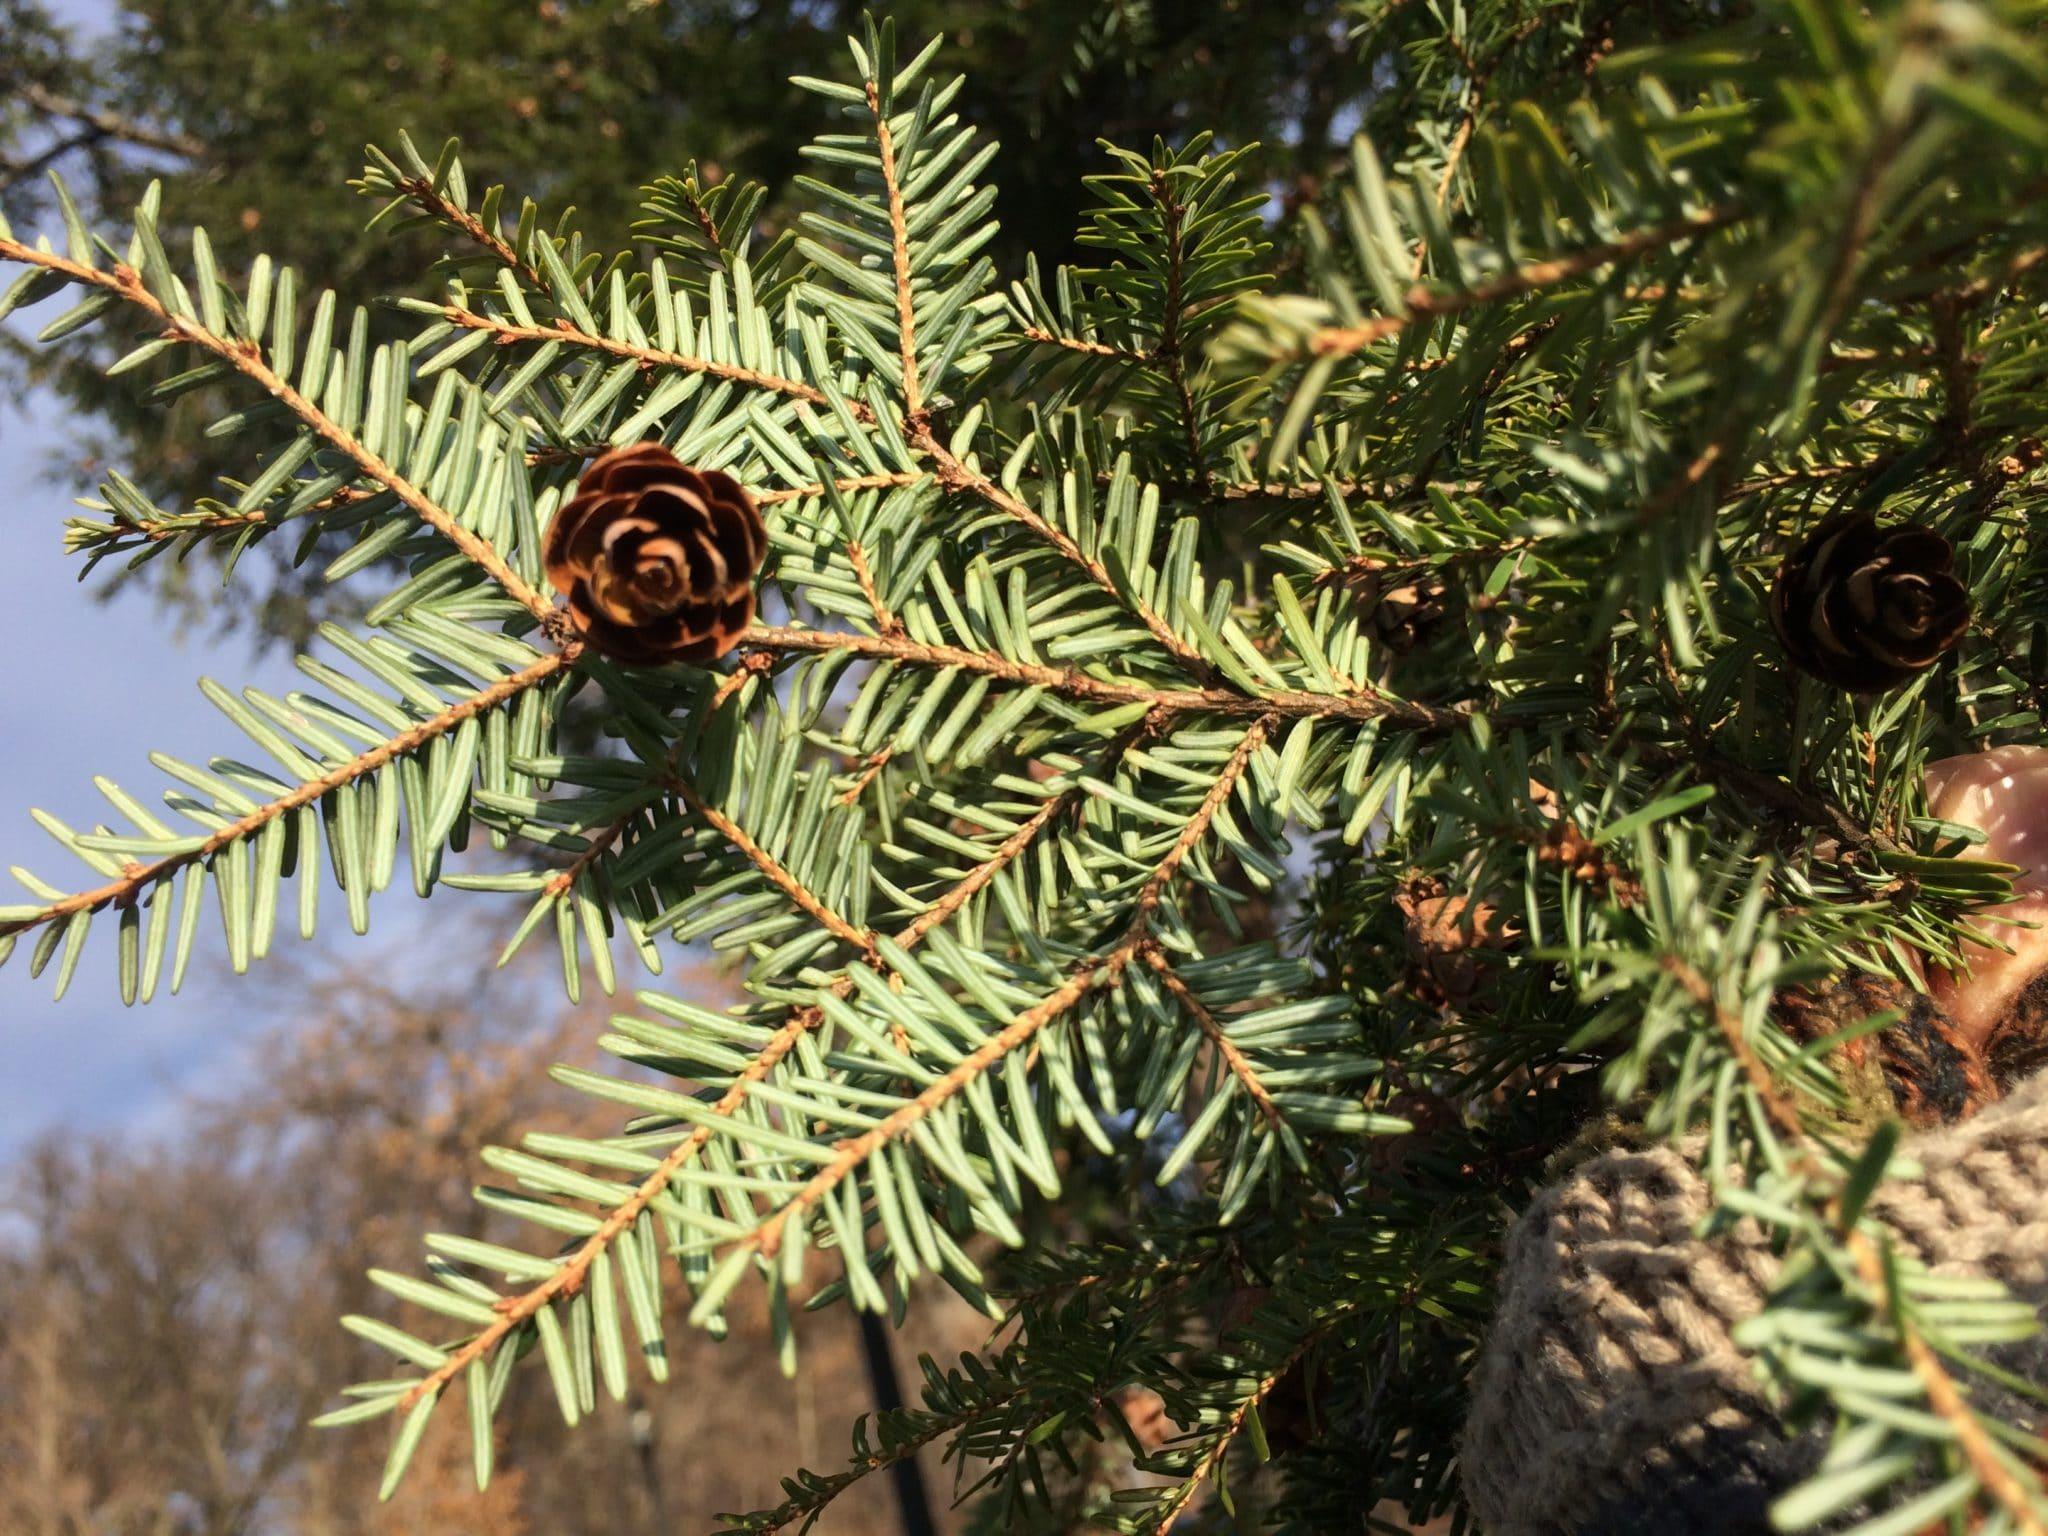 Pine cone in a hemlock branch